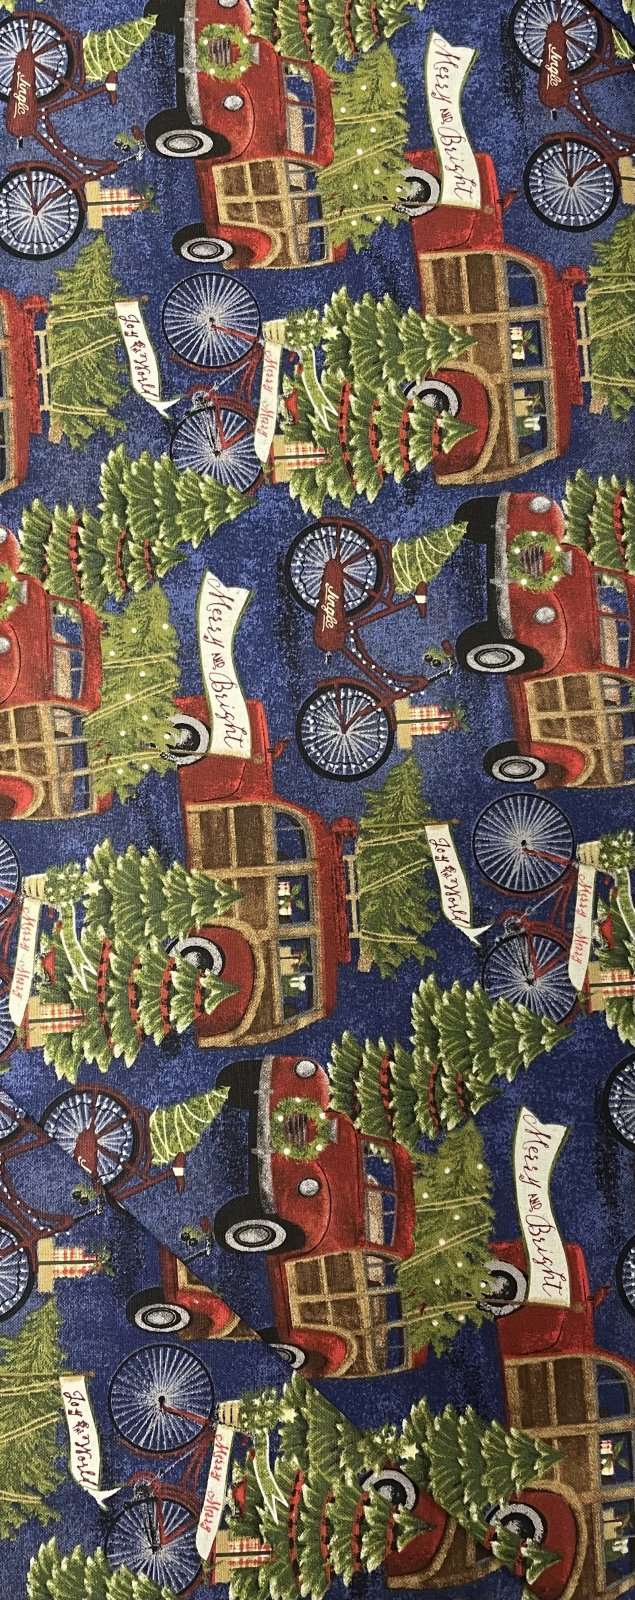 Jingle All The Way - Hauling The Tree